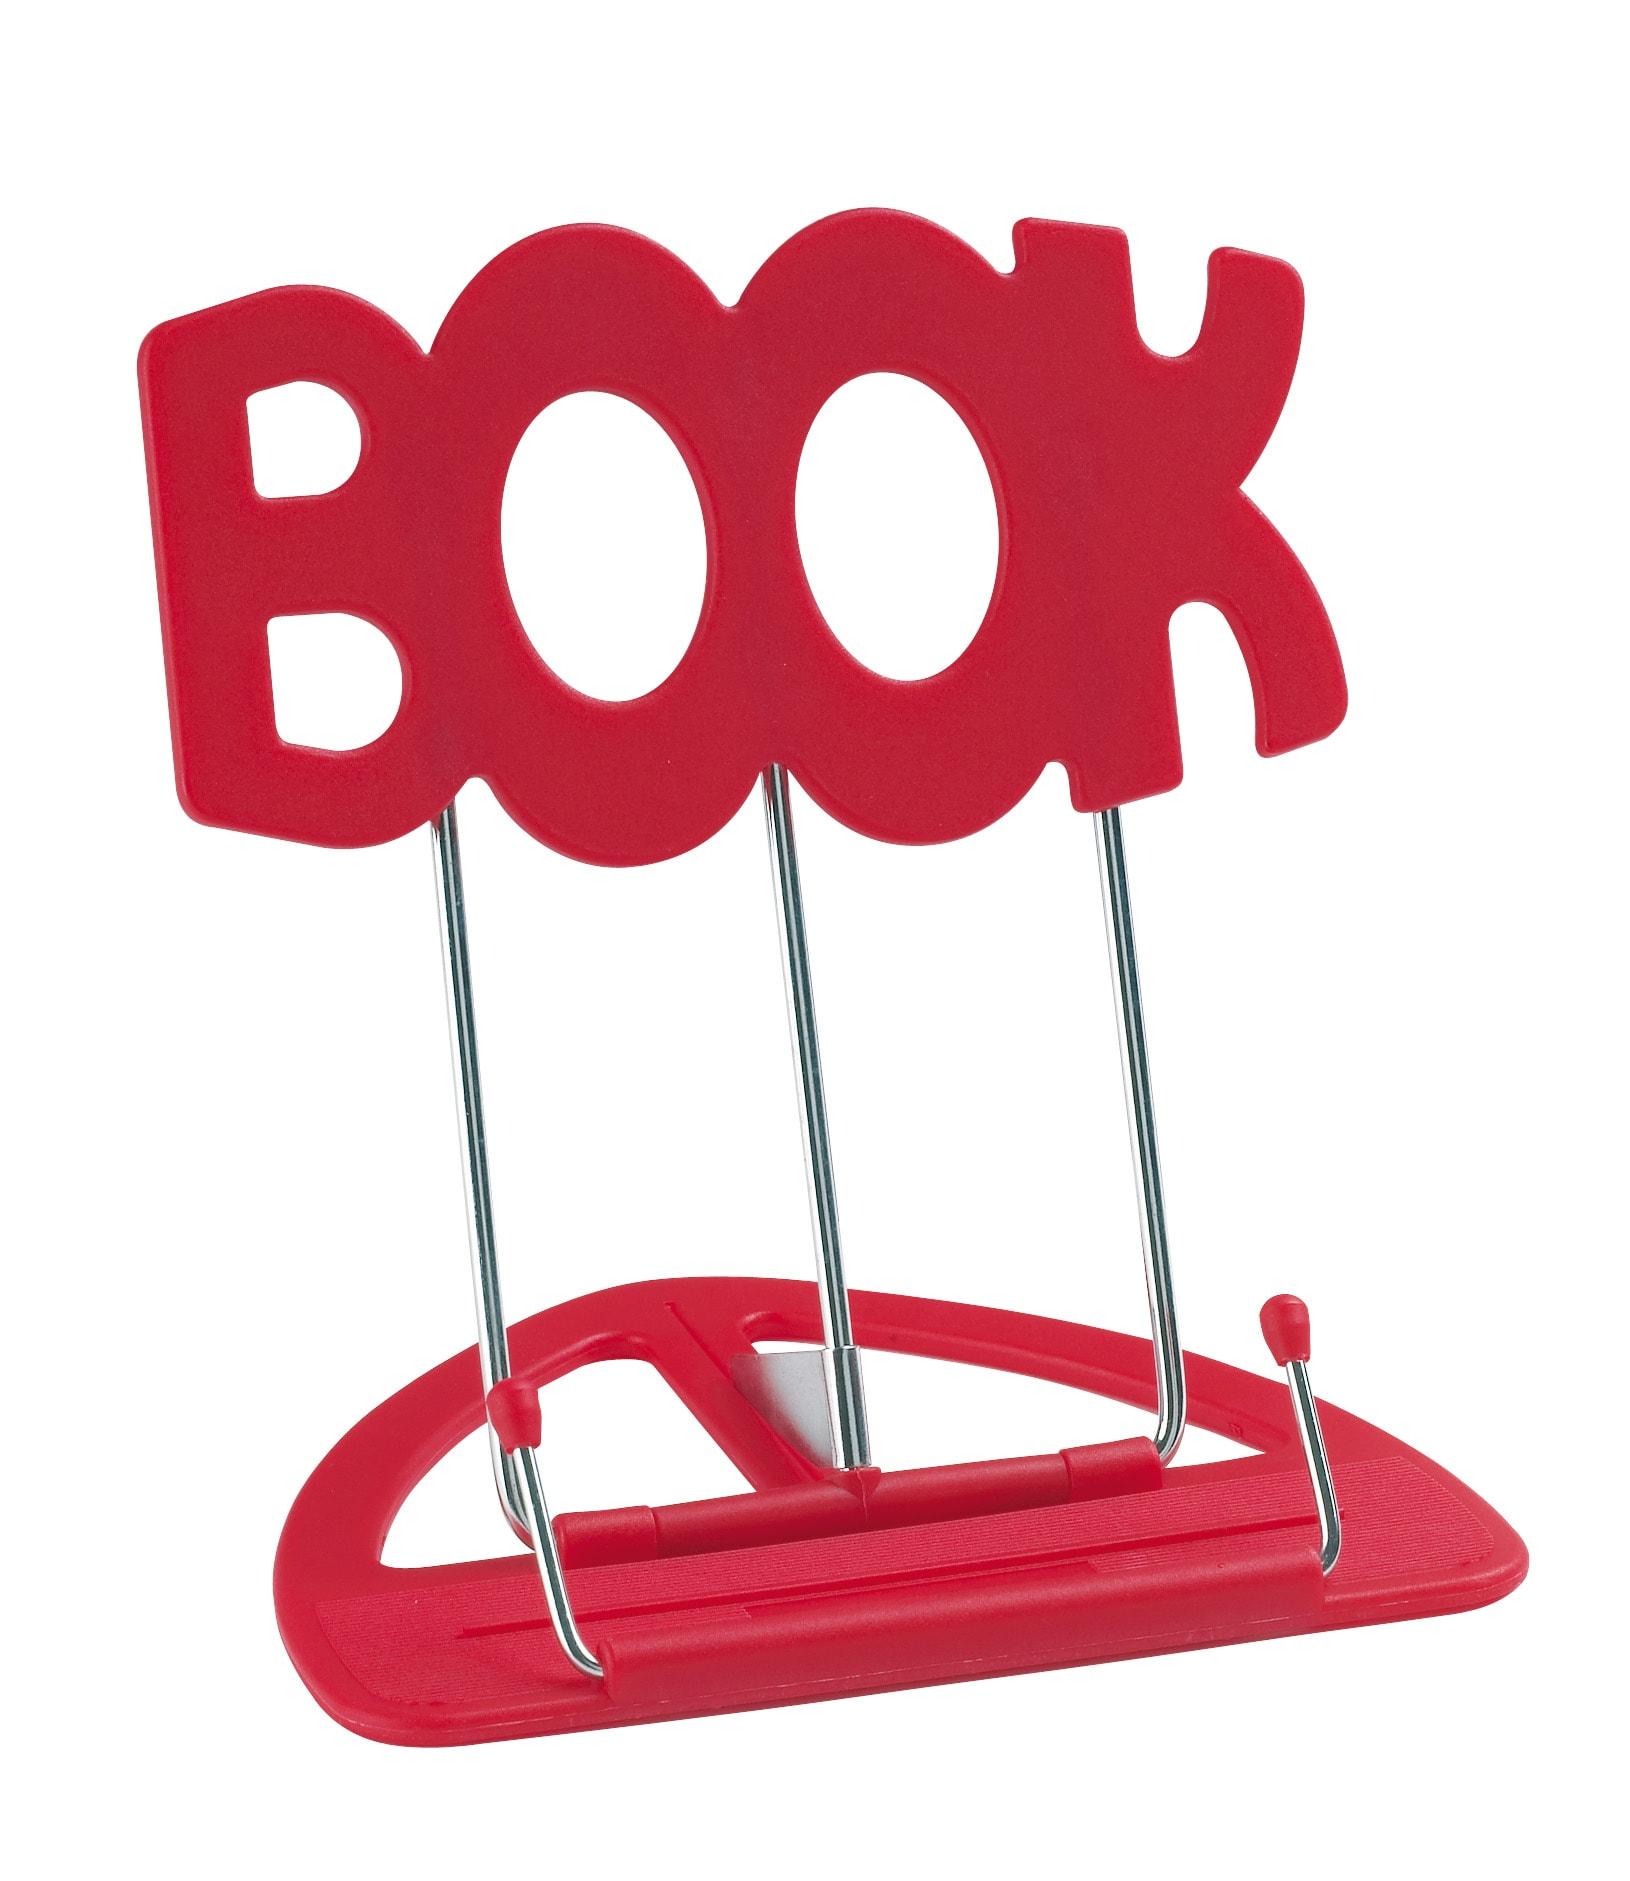 KM12440 - Uni-boy »book« stand